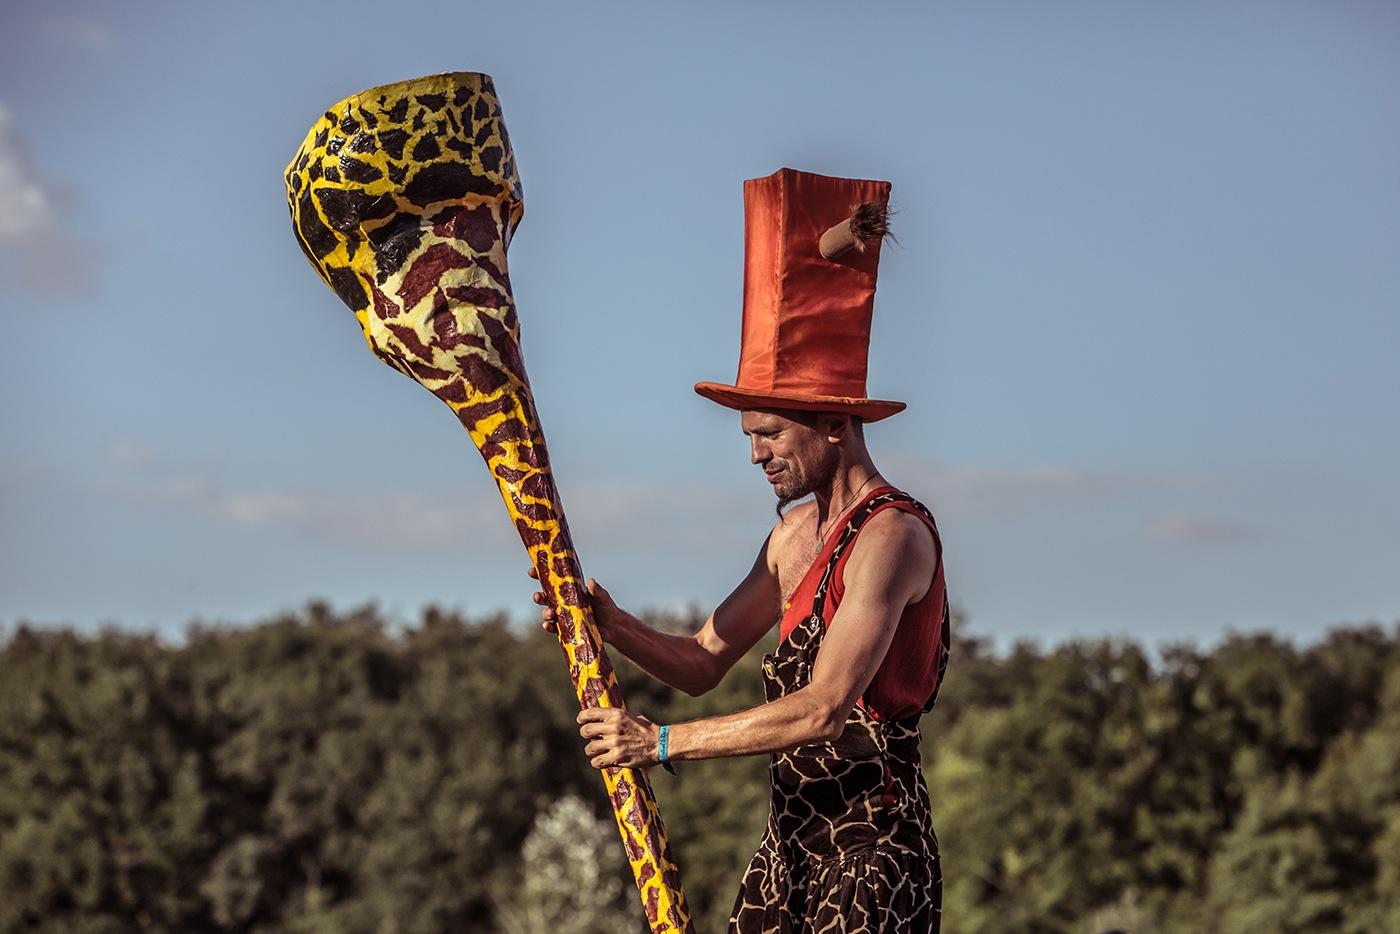 17-photographe-reportage-reve-de-laborigene-2016-guillaume-heraud-girafe-hauteur-small